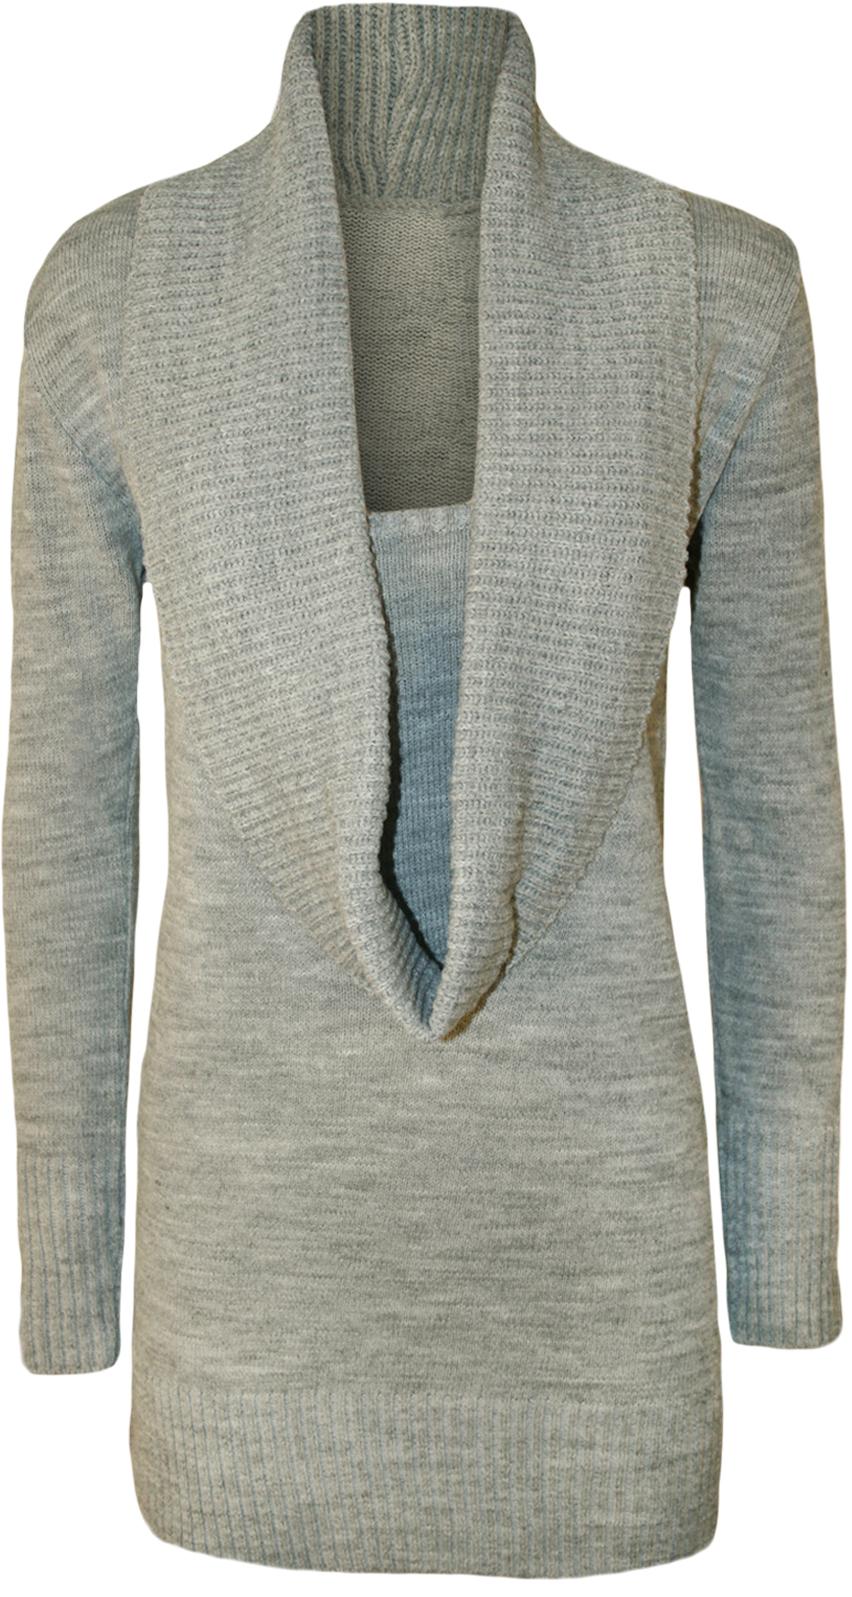 Knitting Pattern Plain Jumper : New Womens Plain Cowl Neck Long Sleeve Insert Ladies Knitted Top Jumper 8 - 1...